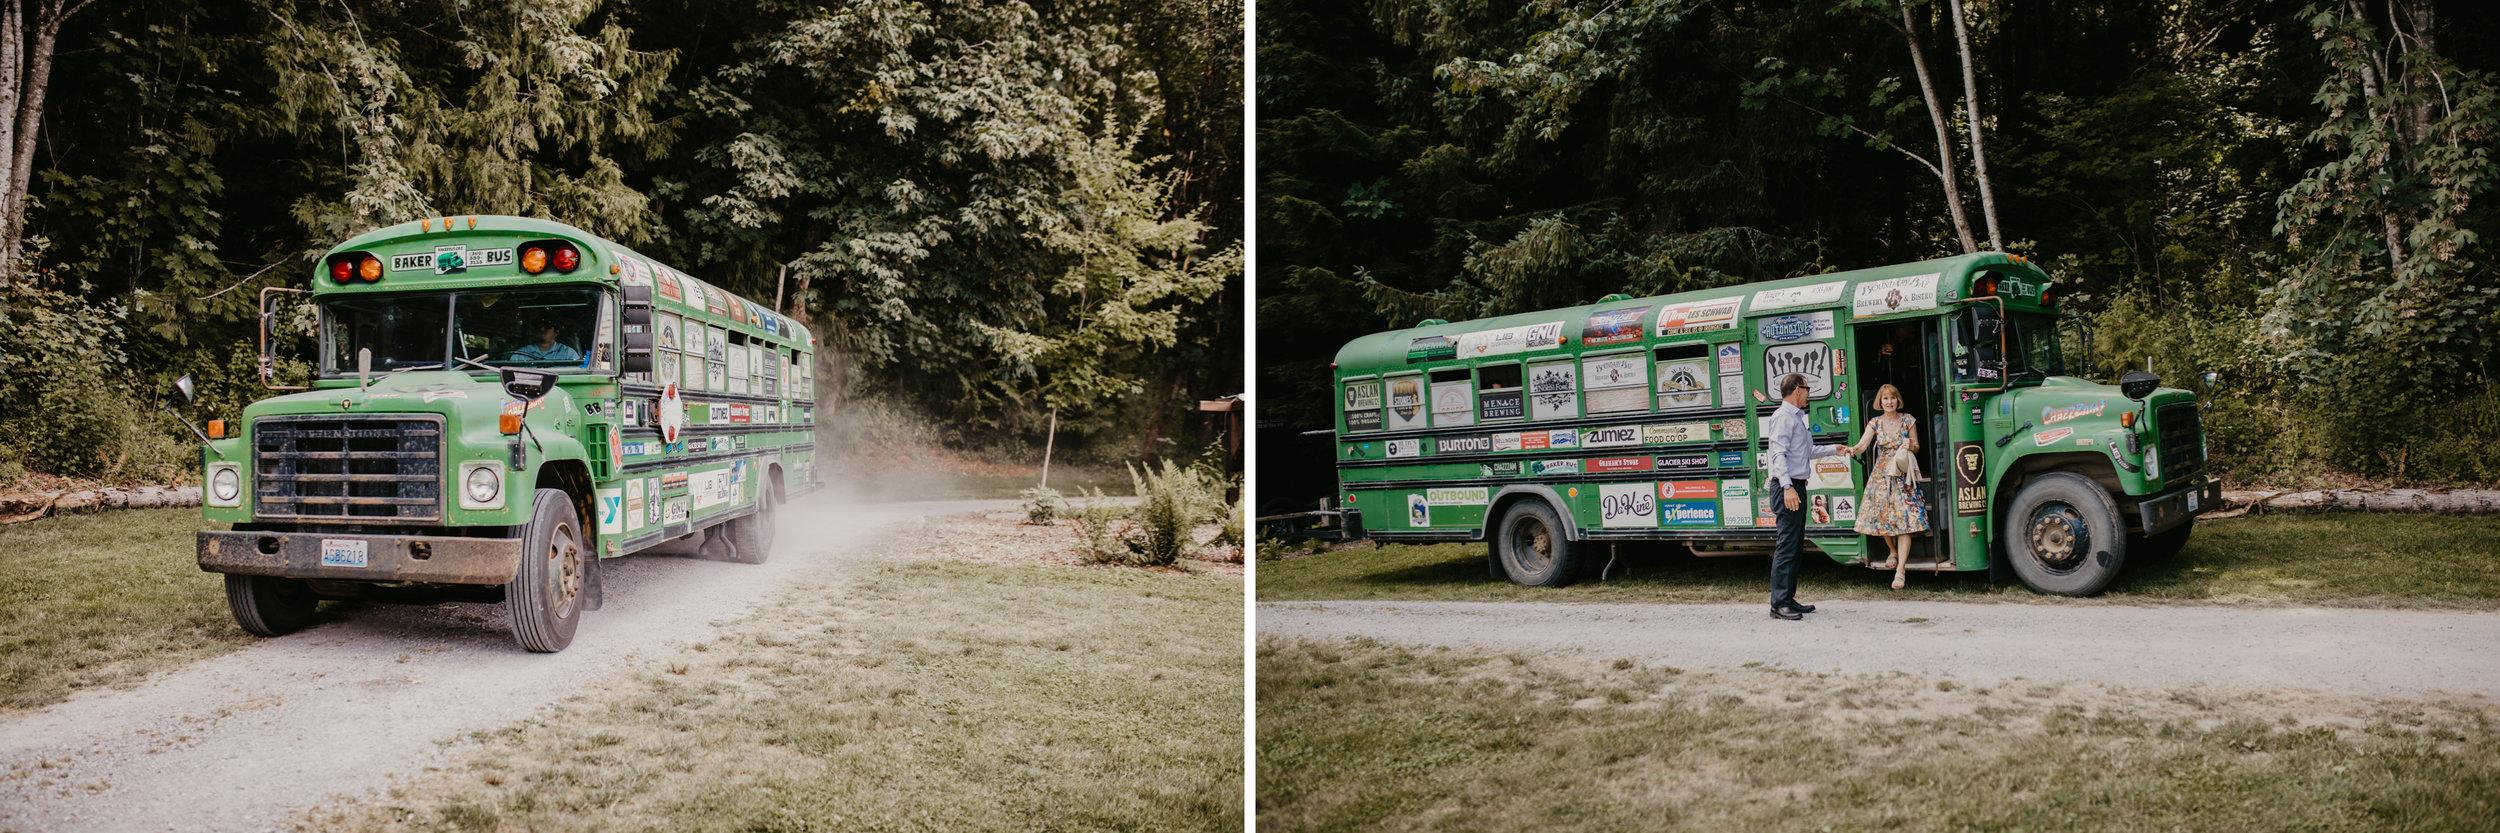 Baker_Bus_Dropoff_1.jpg